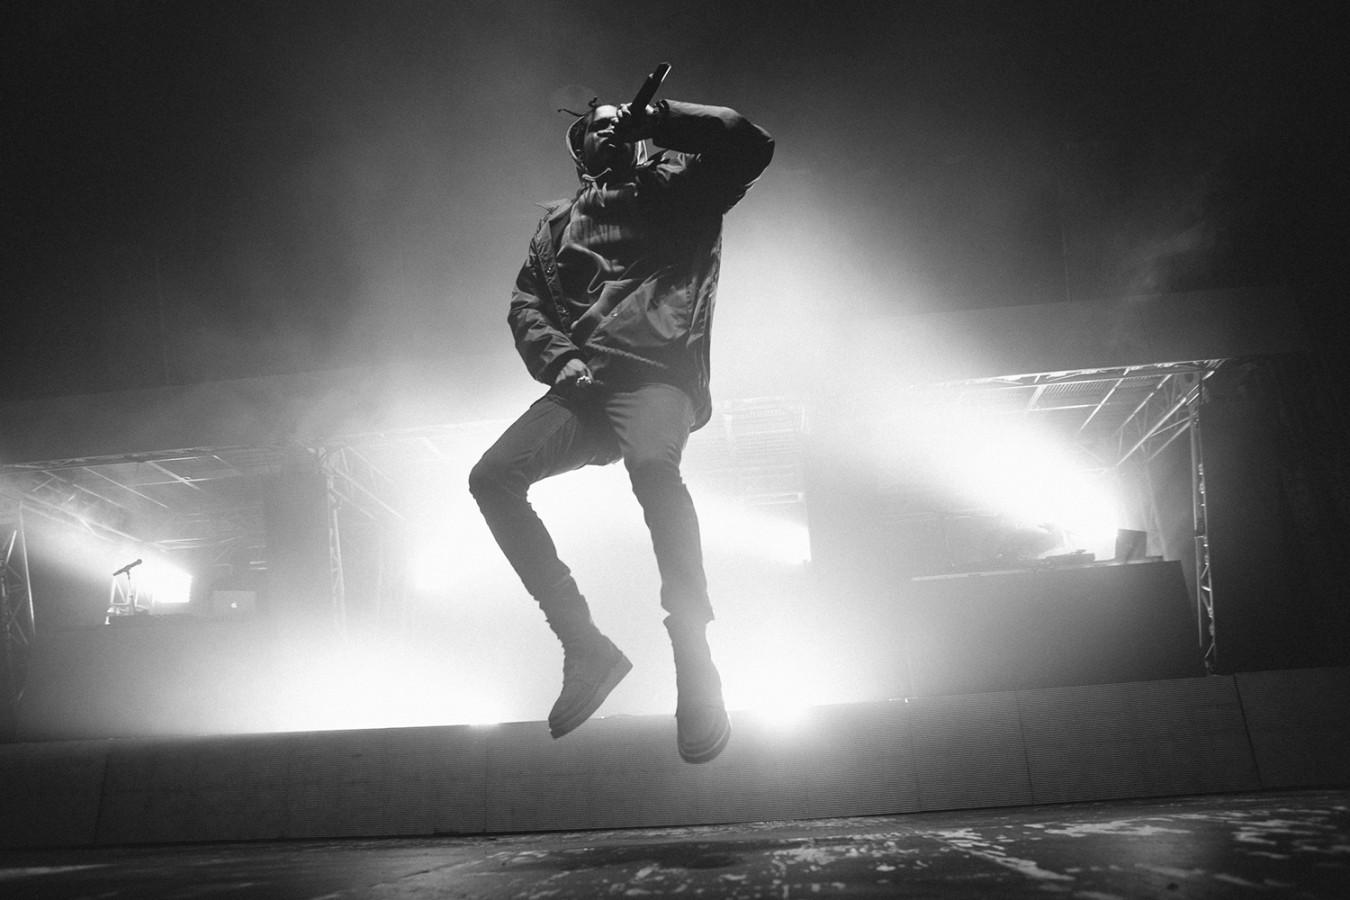 asap-rocky-tyler-the-creator-tour-backstage-32-1350x900